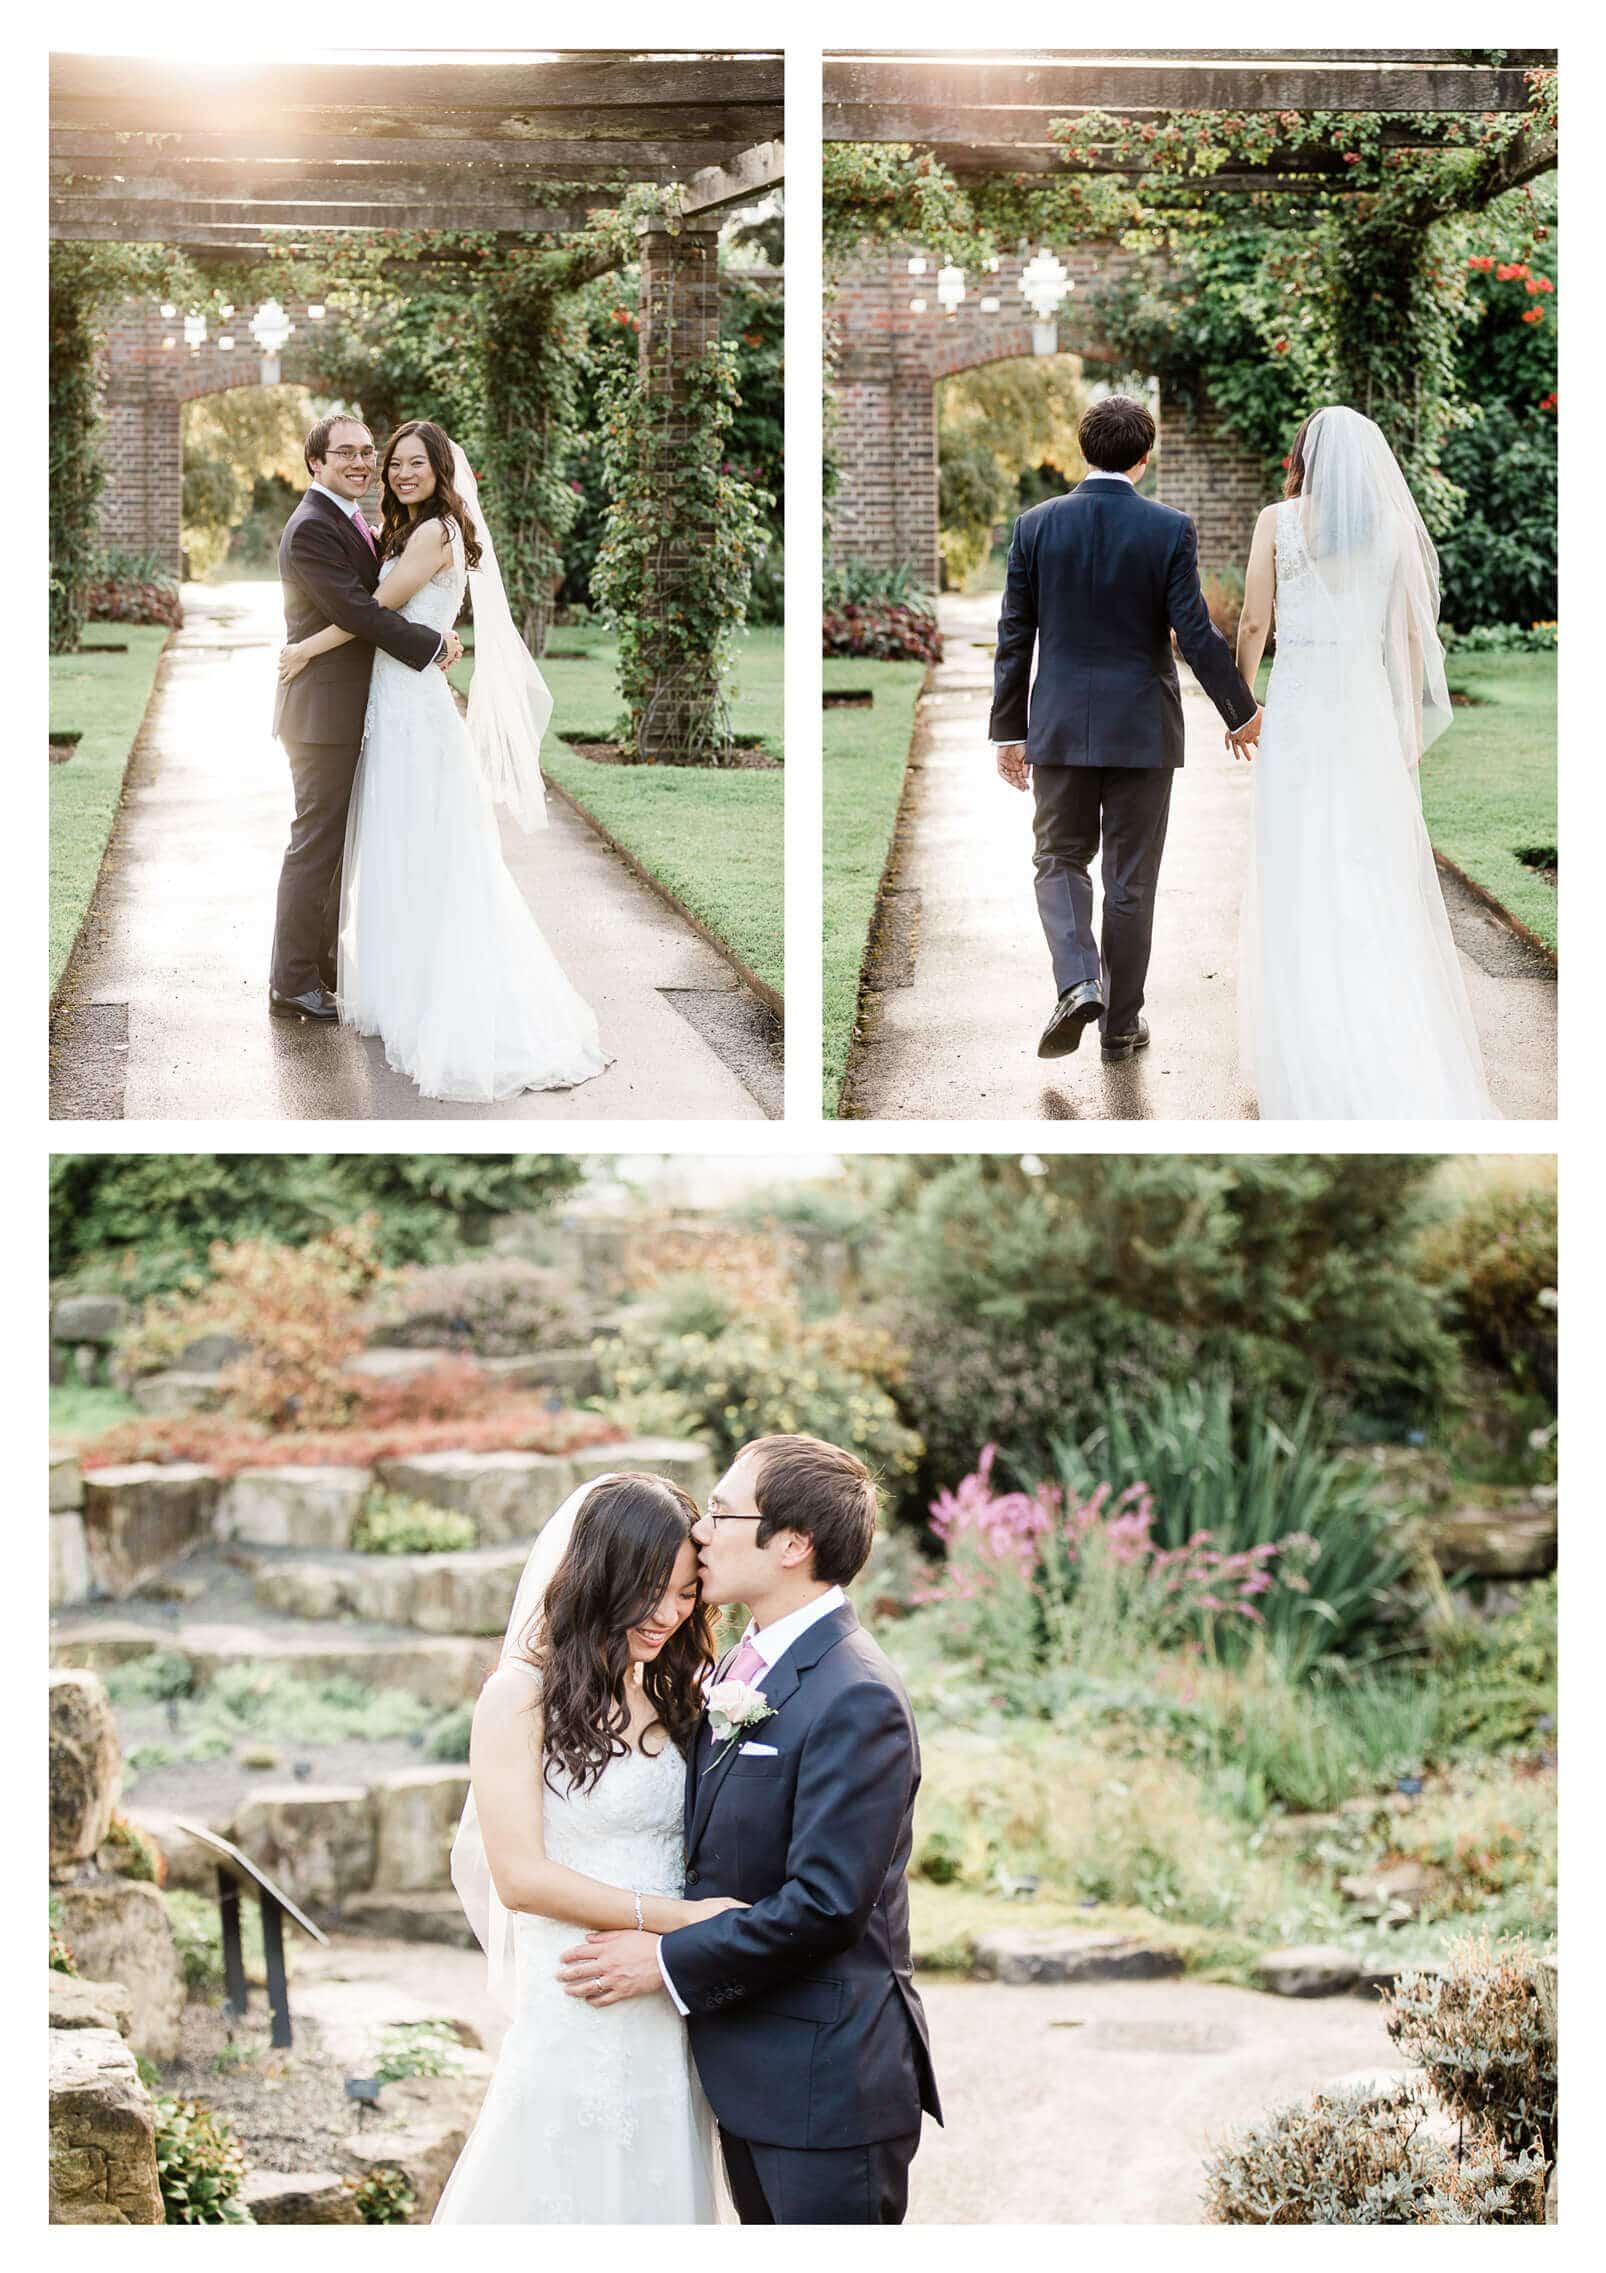 Wilden Bride wedding dress couple portraits at Kew Gardens | London photographer